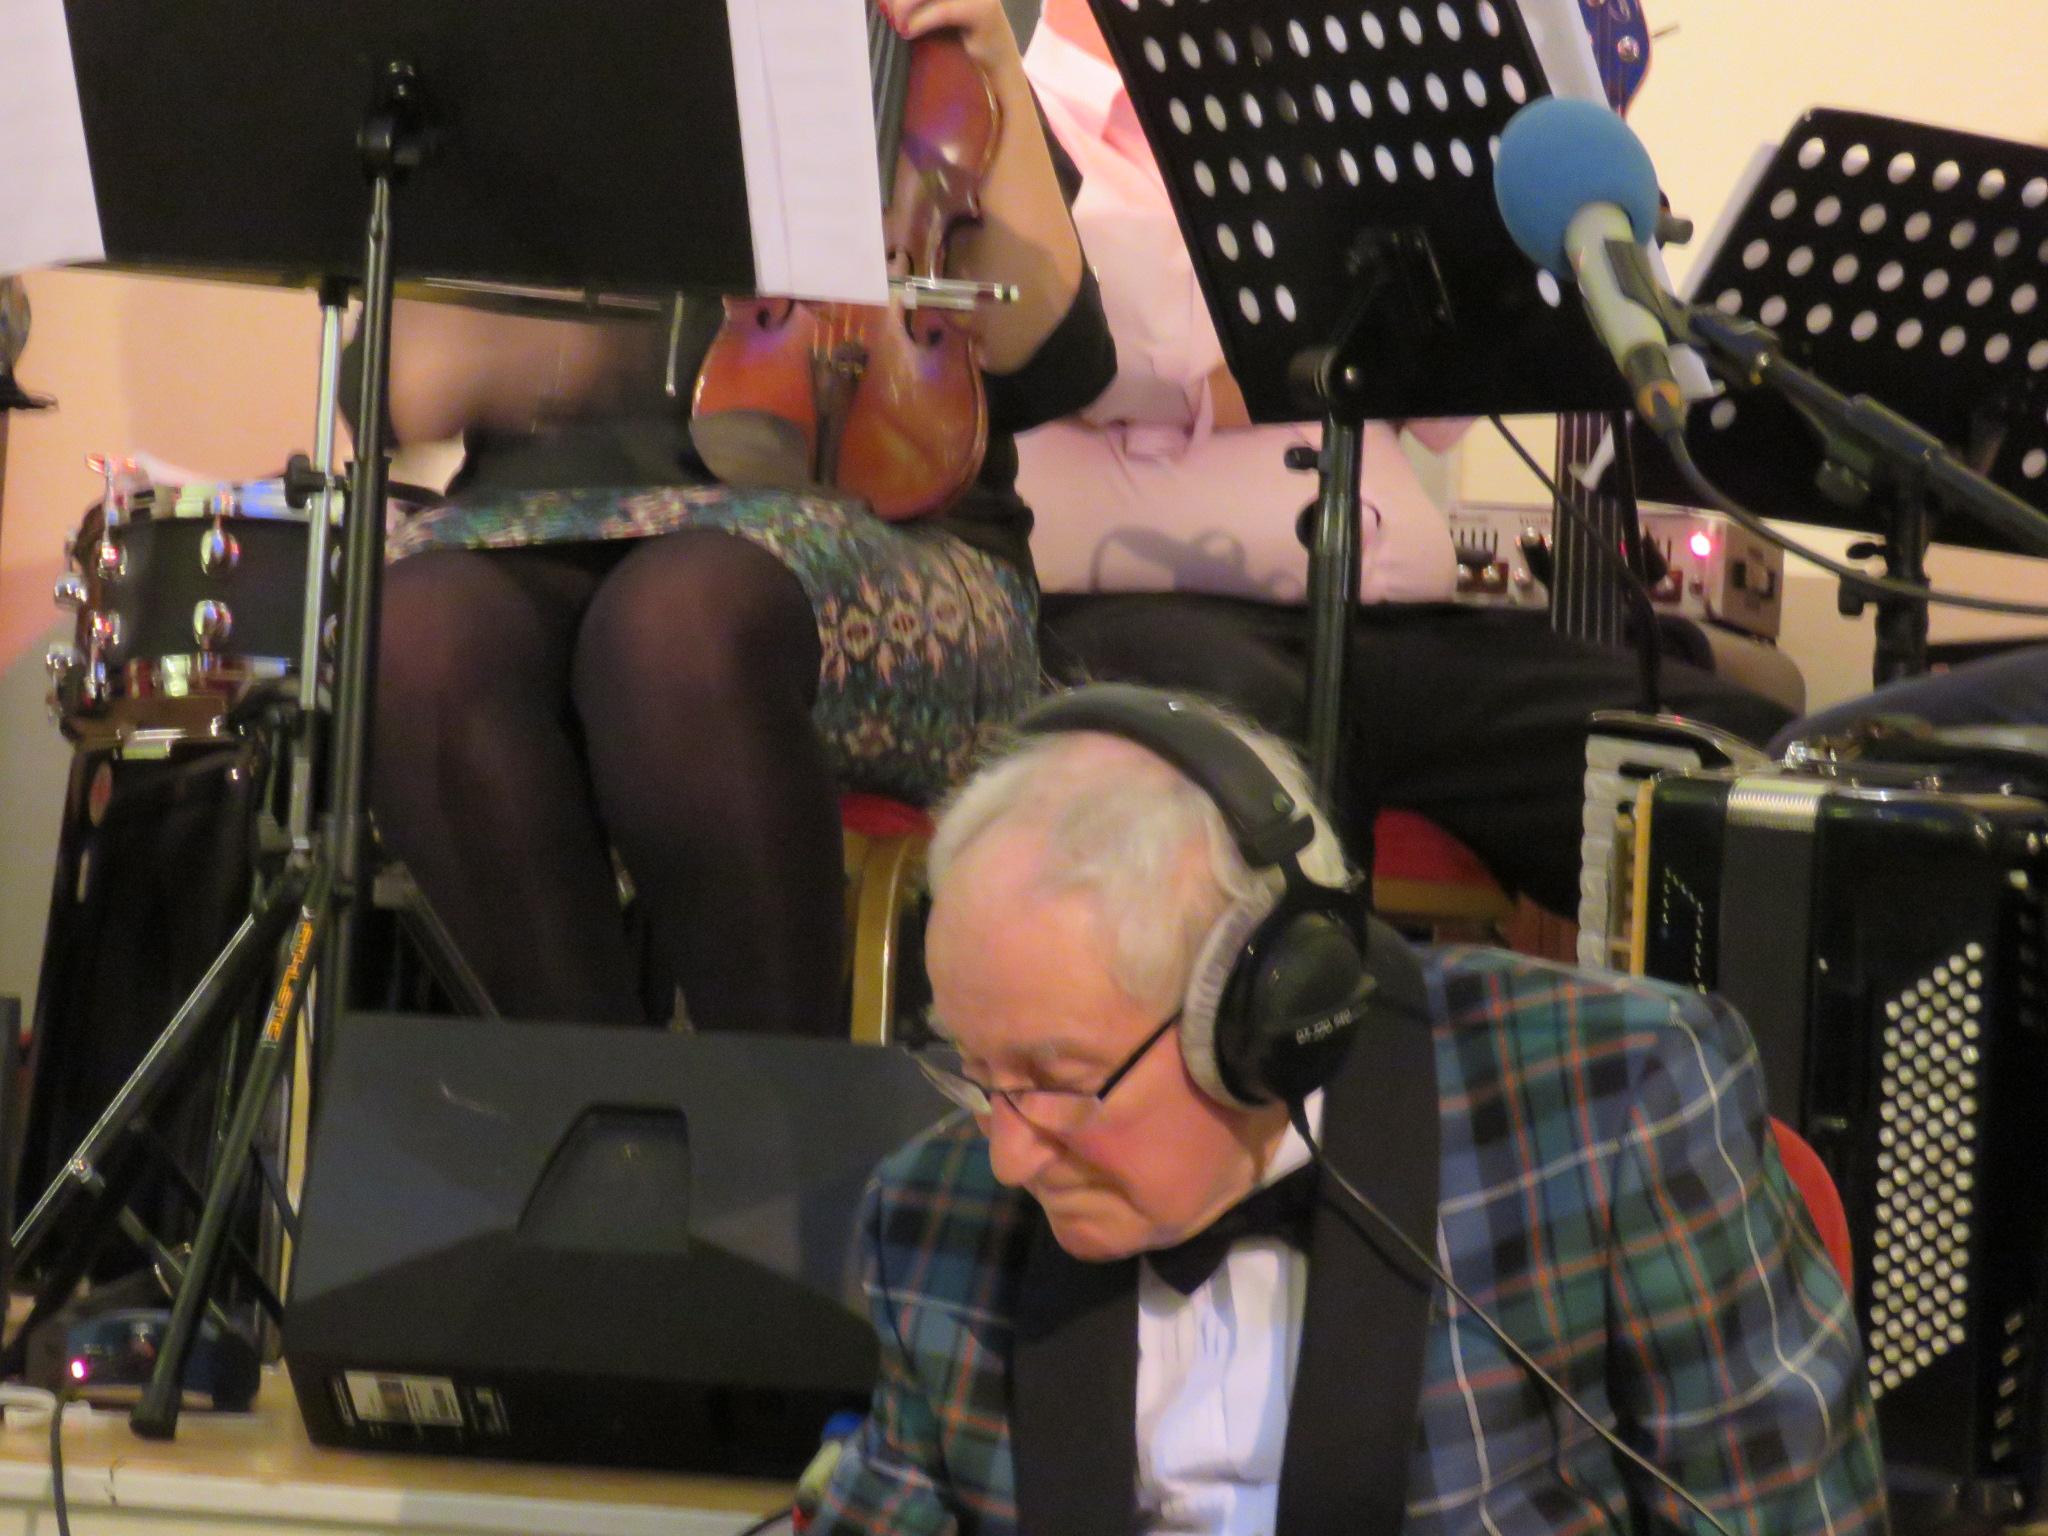 Robbie Shepherd with BBC Scotland's Take The Floor